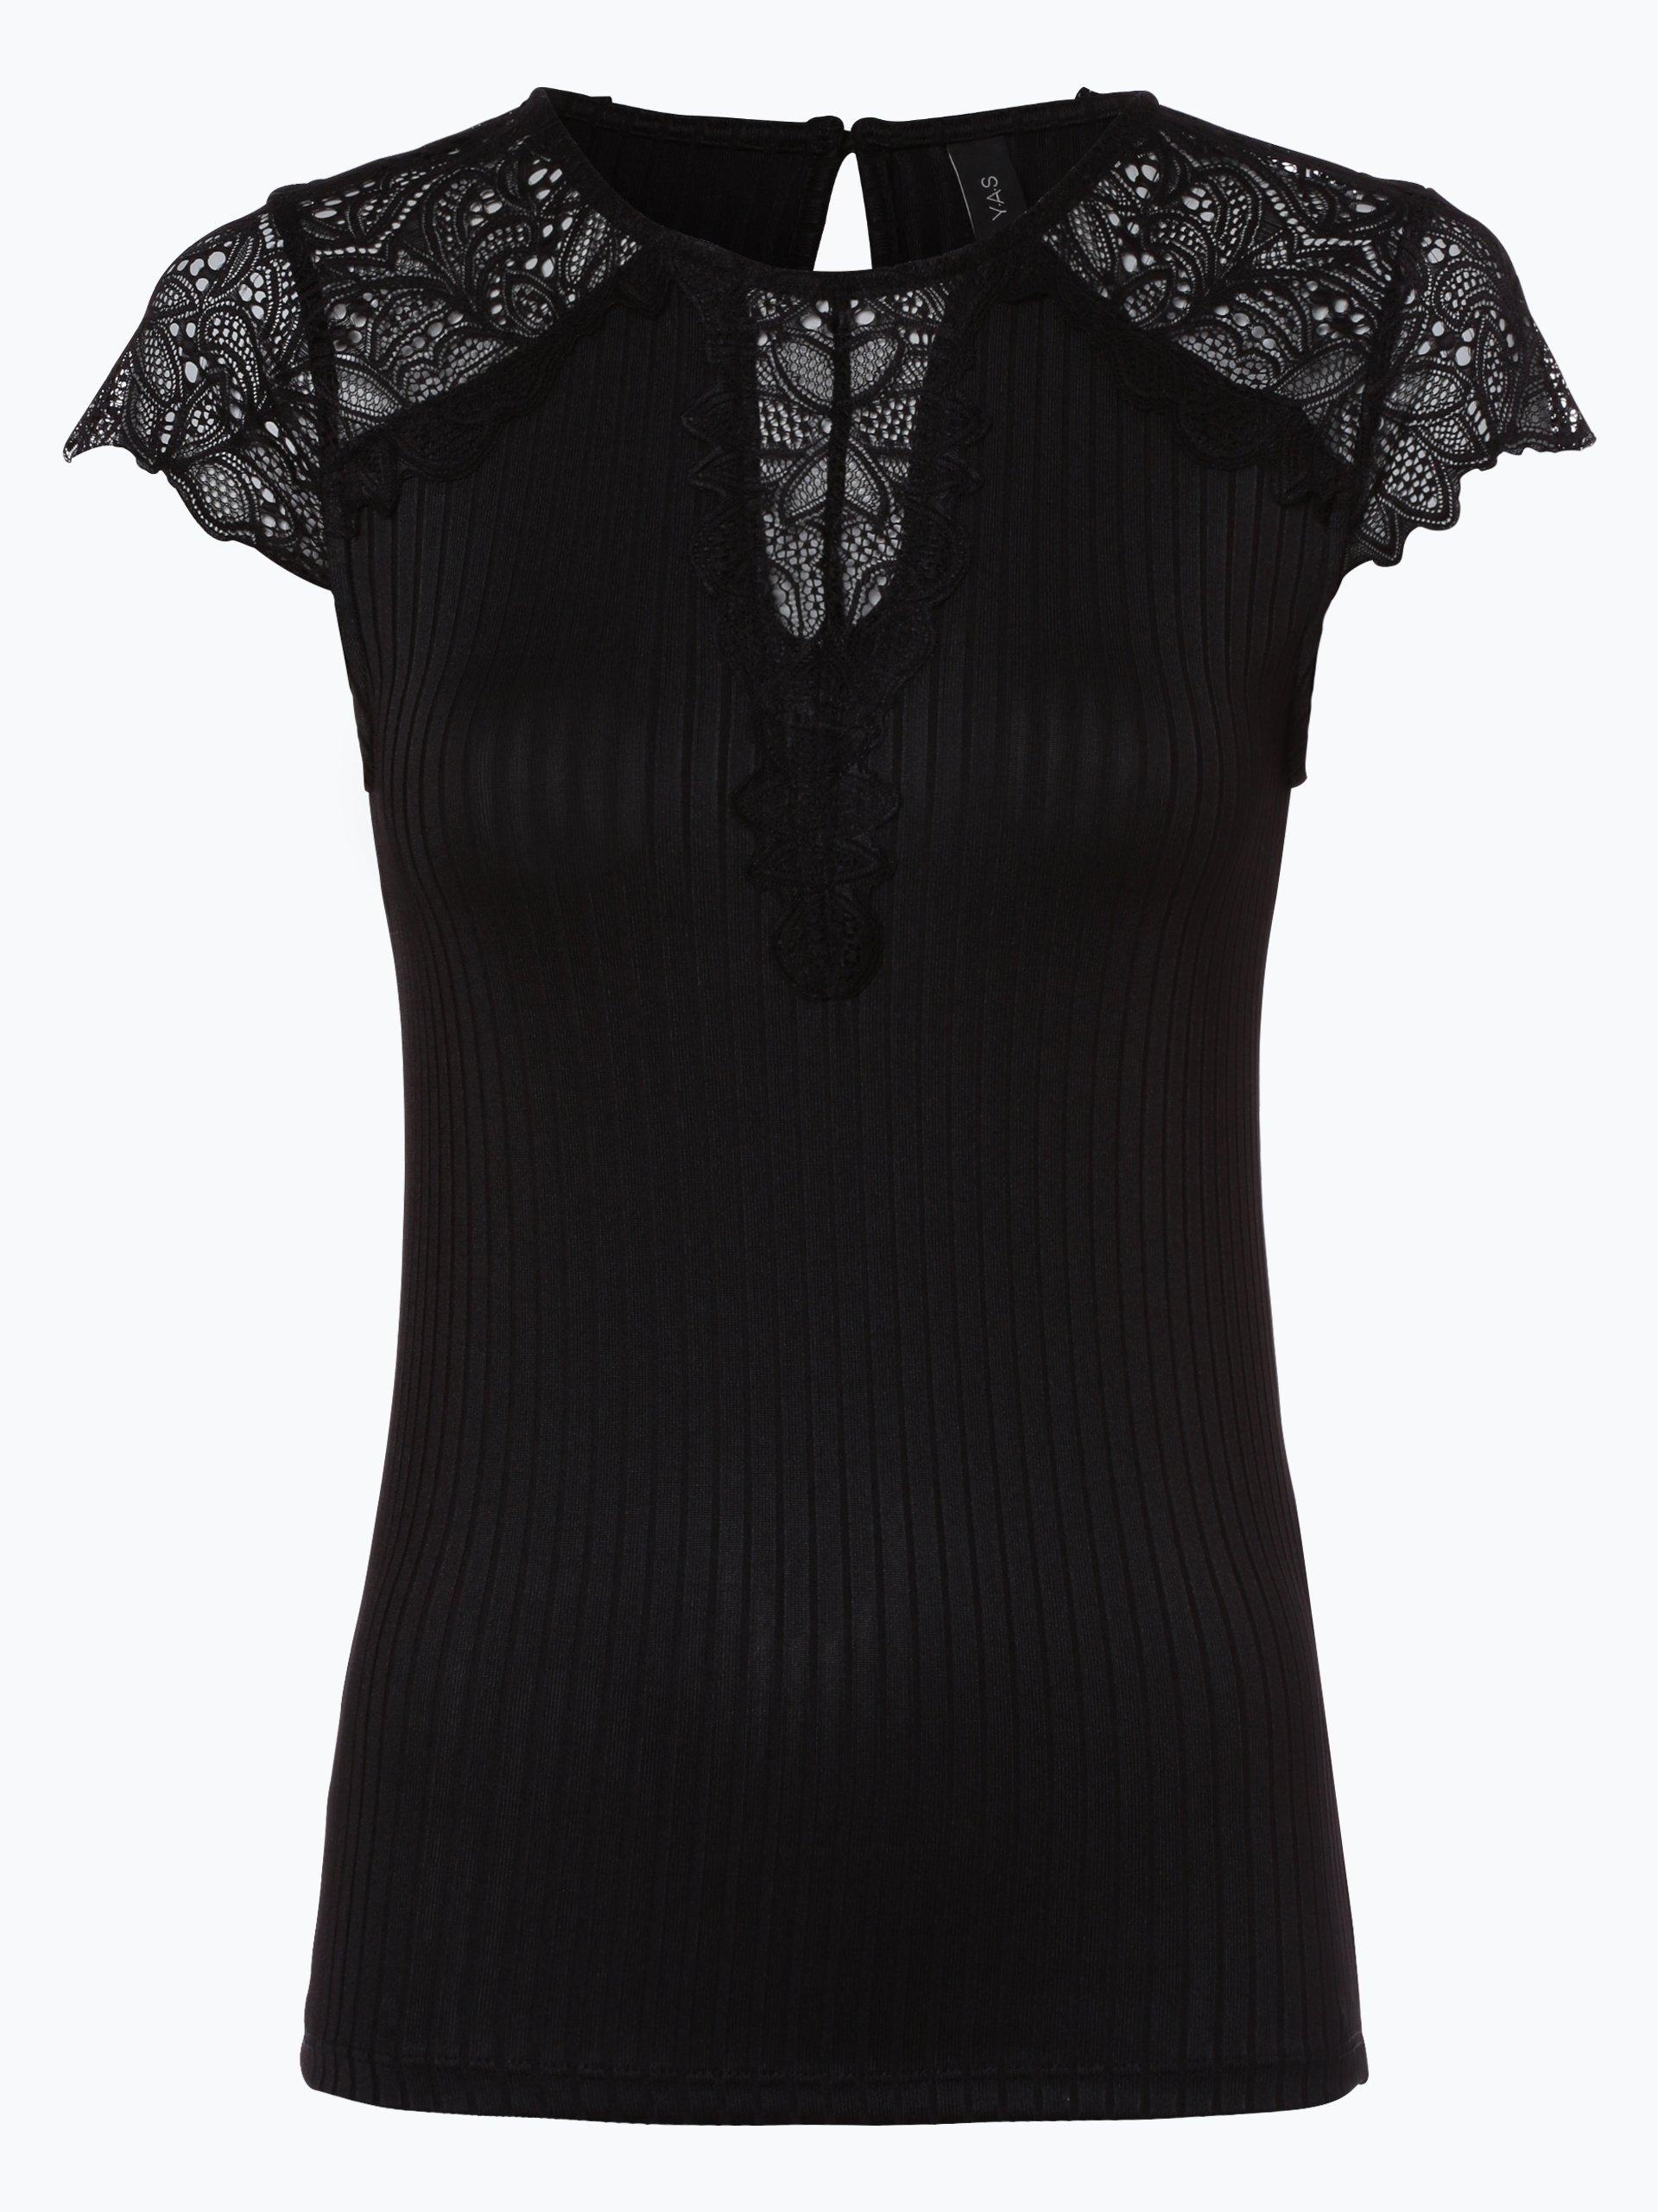 Y.A.S Damen T-Shirt - Blace